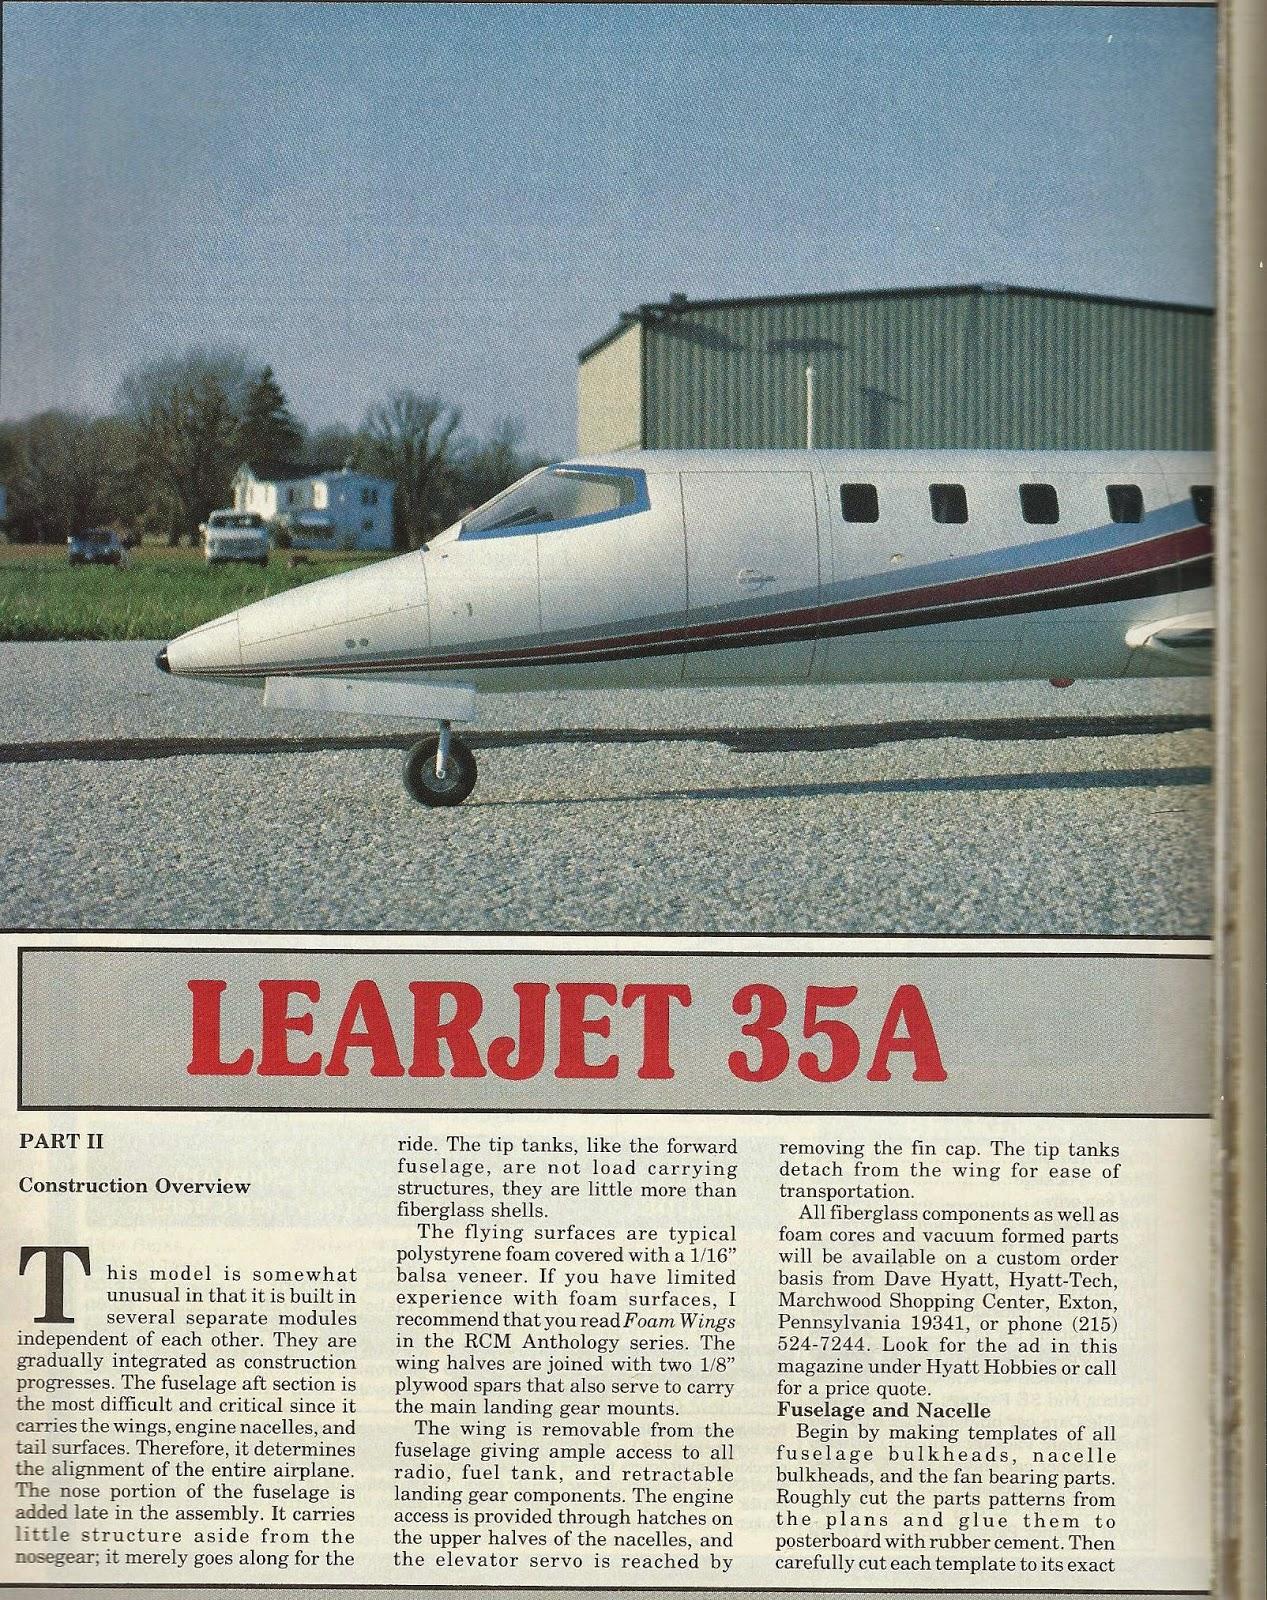 Learjet Engine Diagram Lakewood Heater Wiring Diagram Ls1 Corvette – Learjet Engine Diagram